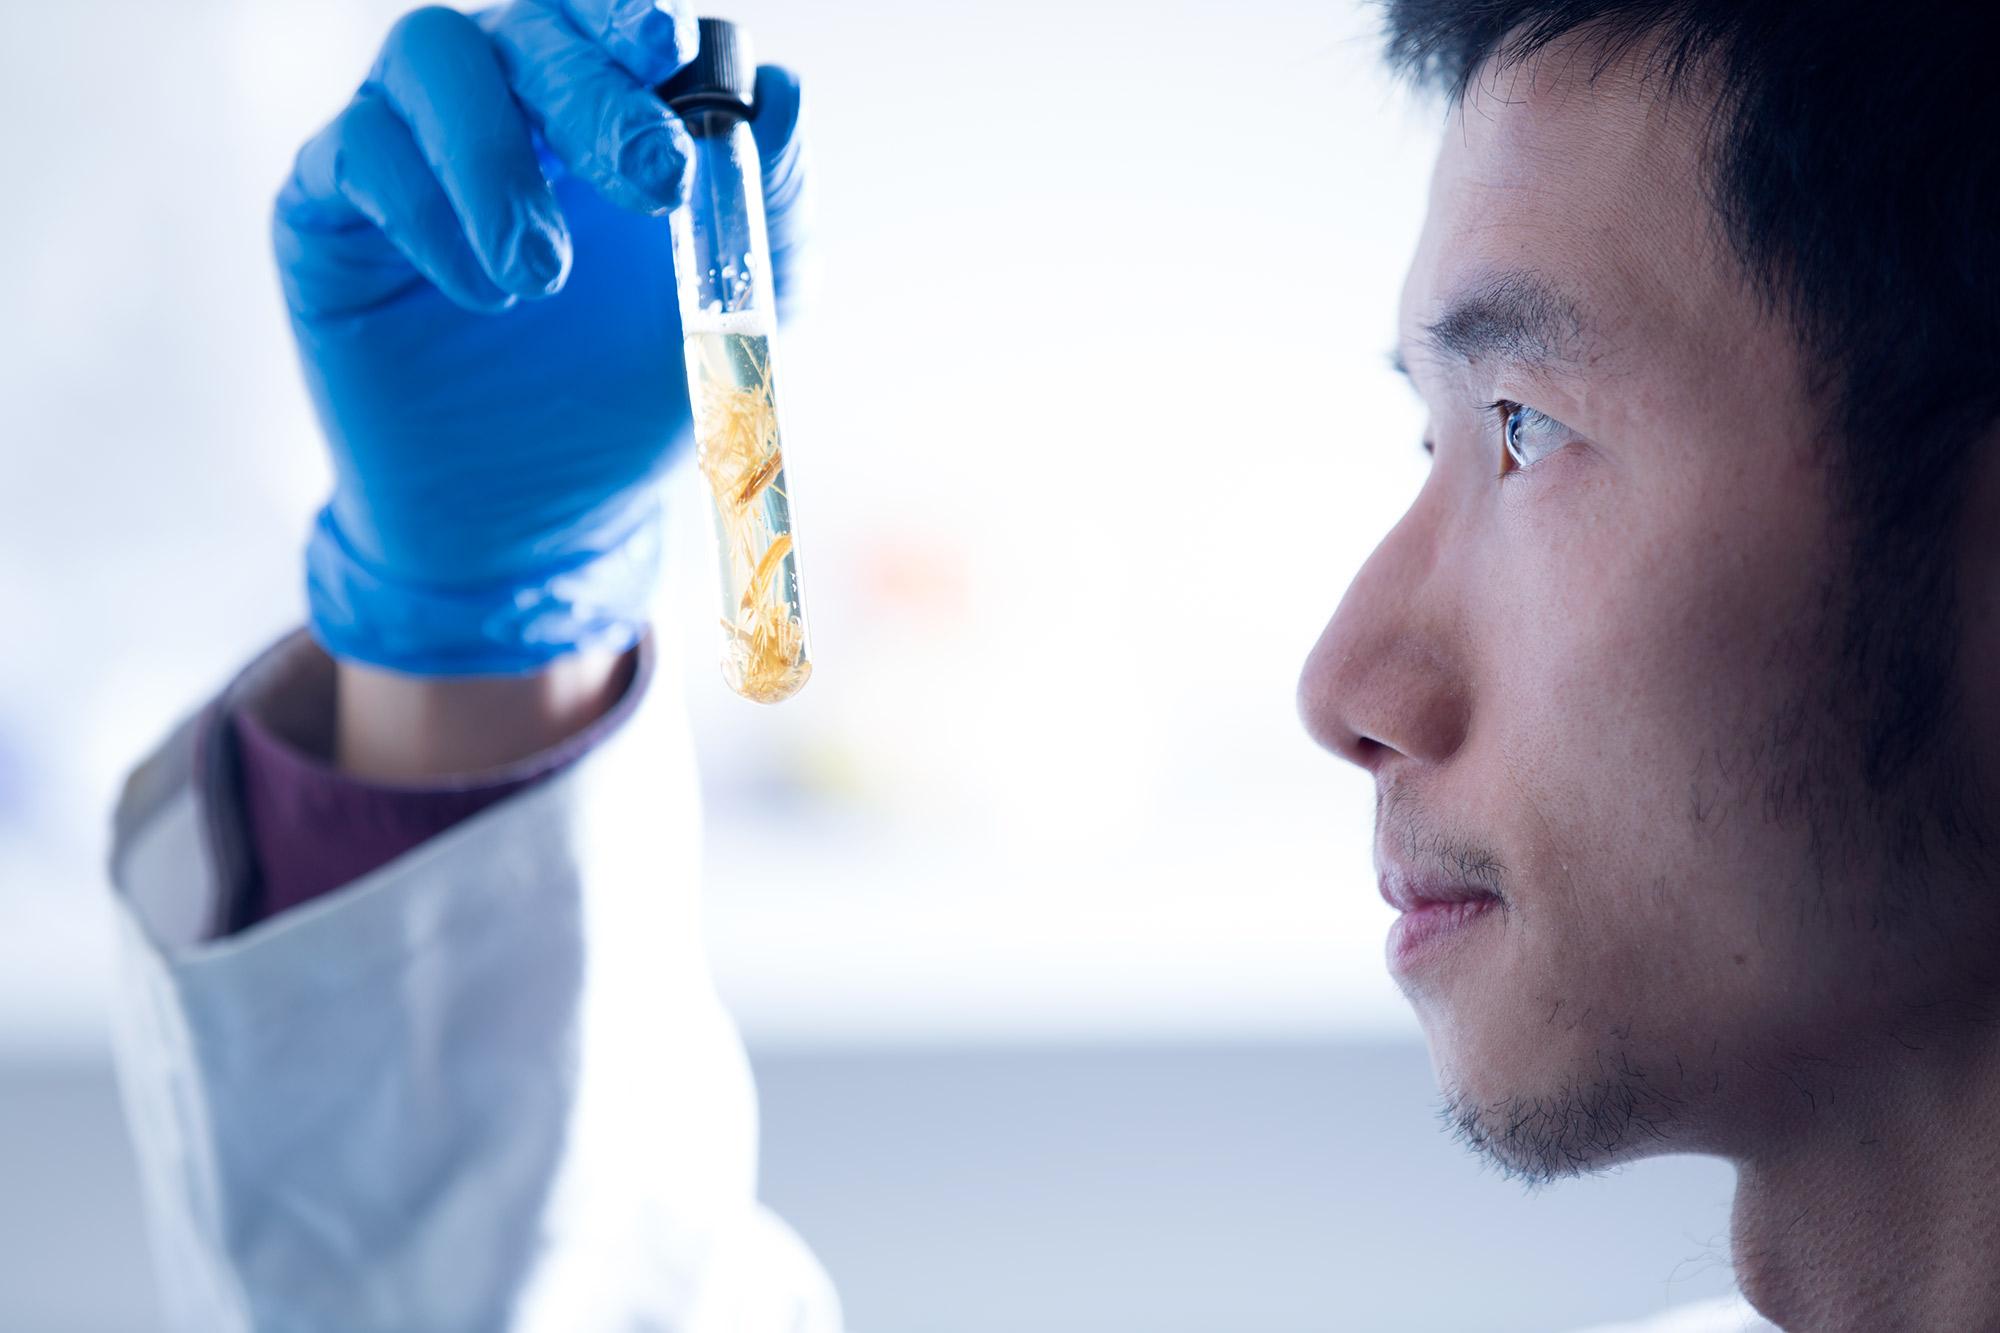 Center for Bio Engineering - UC Santa Barbara